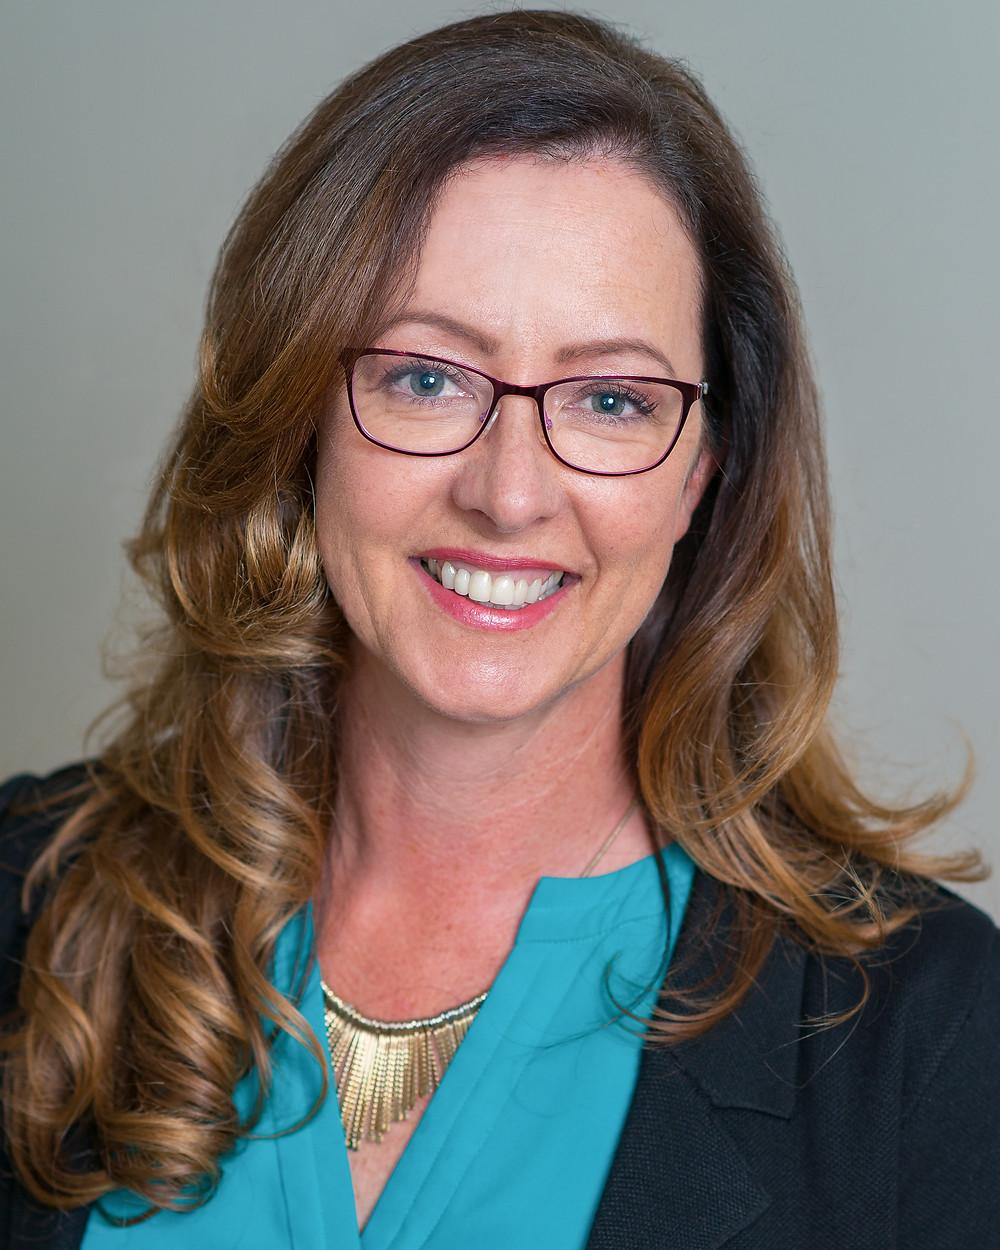 headshot of Christine Bechtel